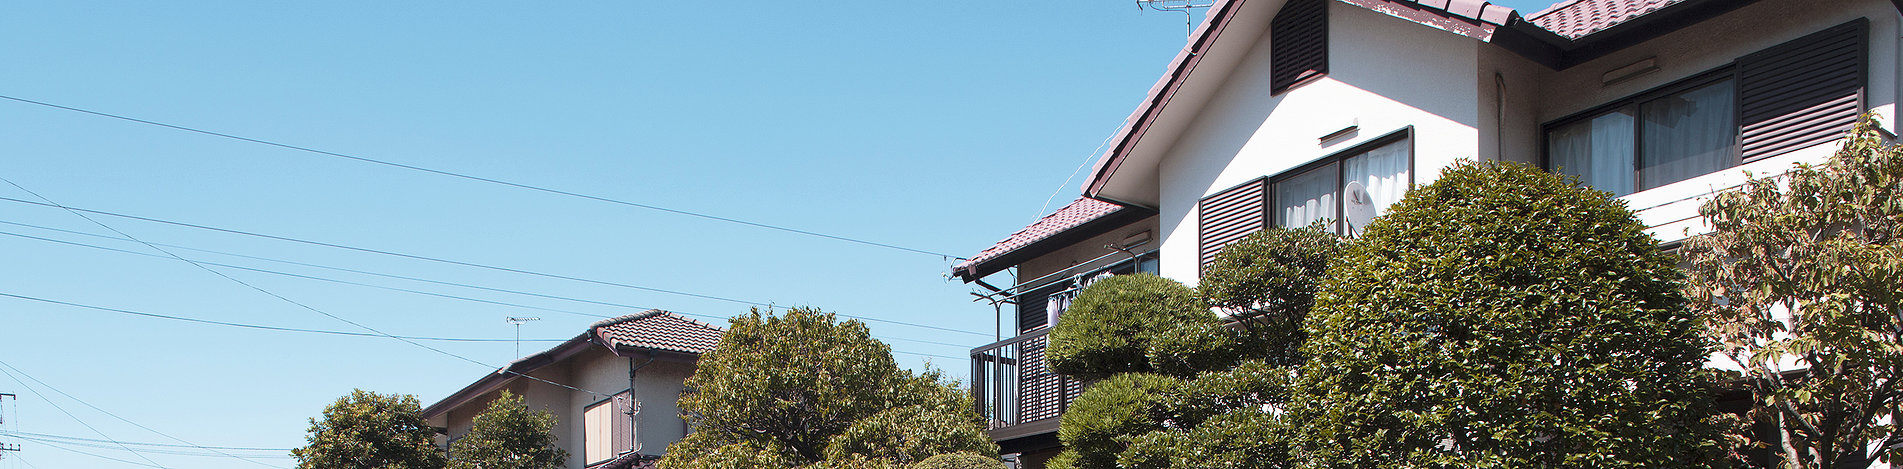 Мир недвижимости от CofranceSARL